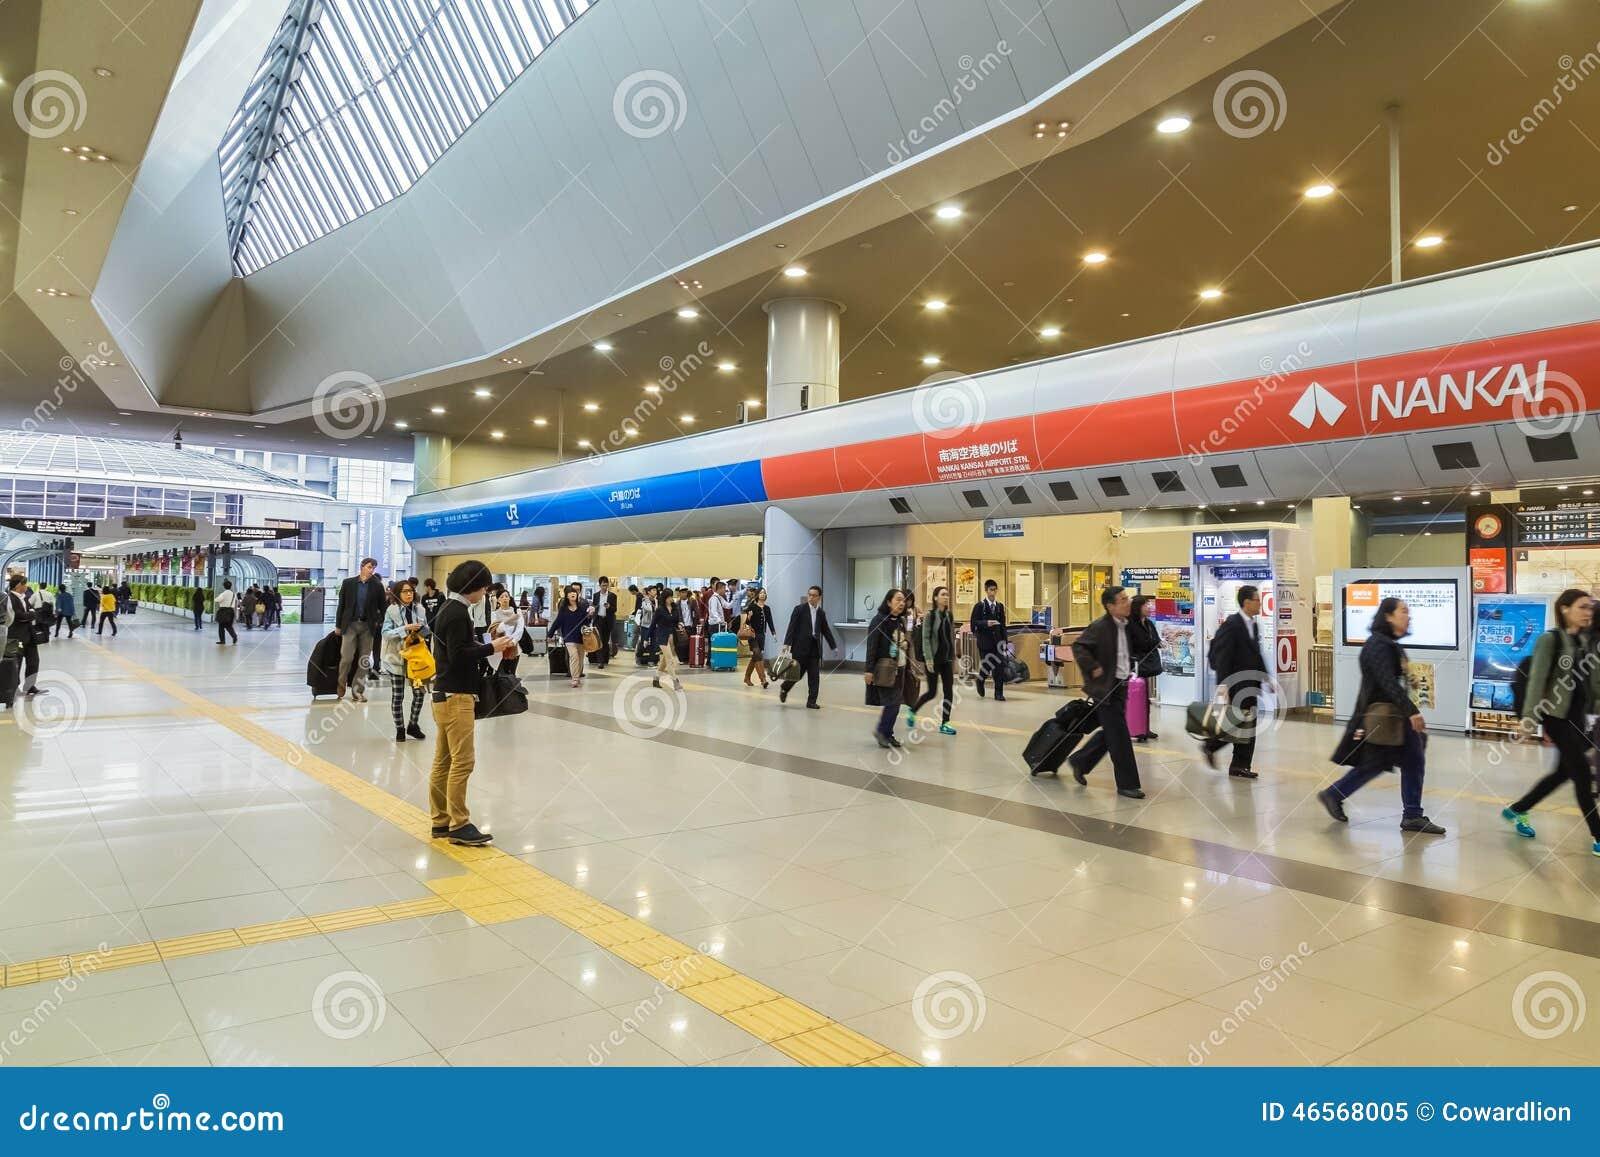 Aeroporto Kansai Osaka : Stazione dell aeroporto di kansai a osaka immagine